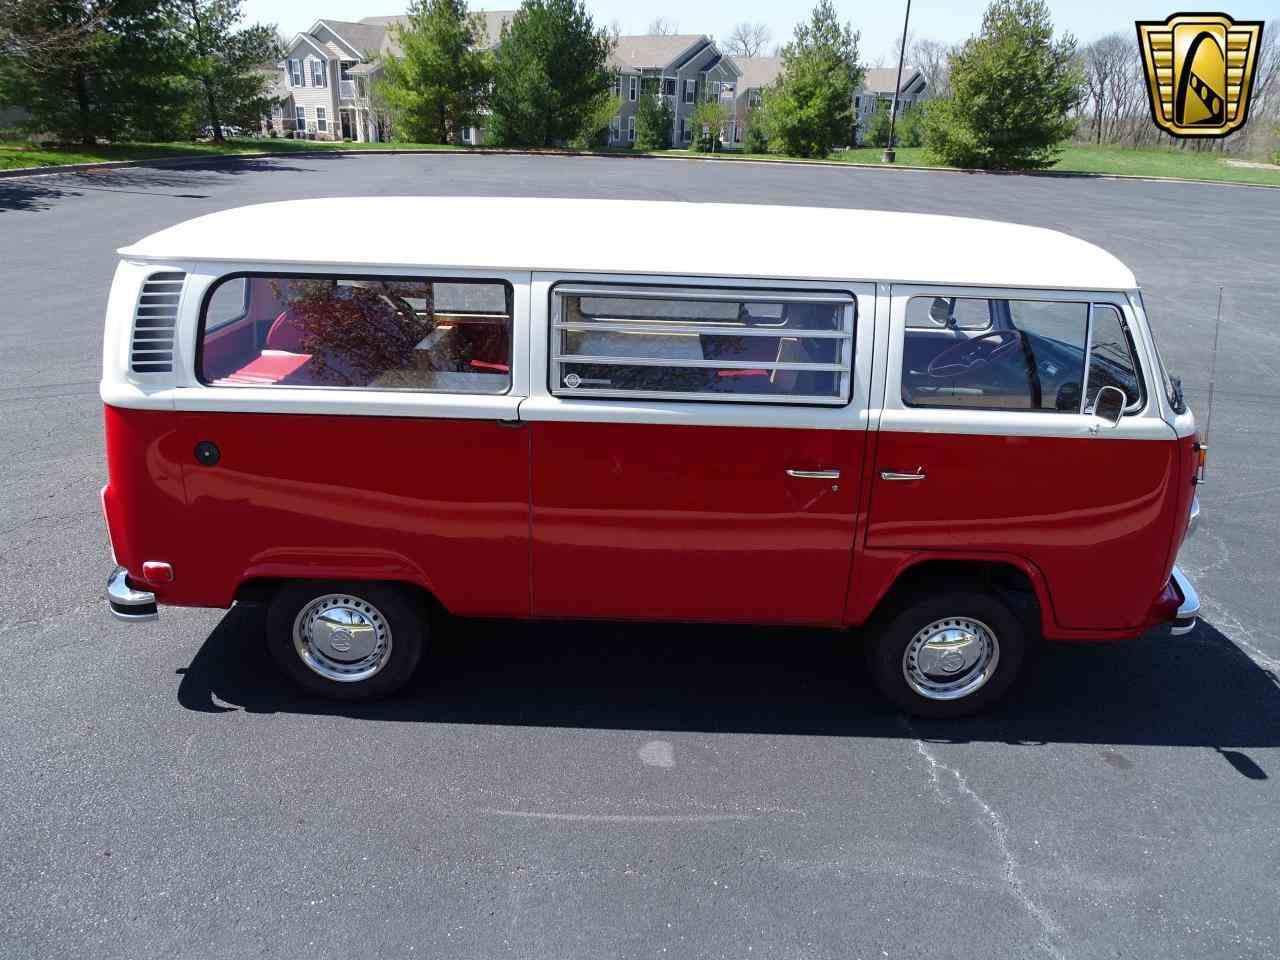 Large Picture of 1974 Volkswagen Westfalia Camper located in Illinois - $34,995.00 - NEEL